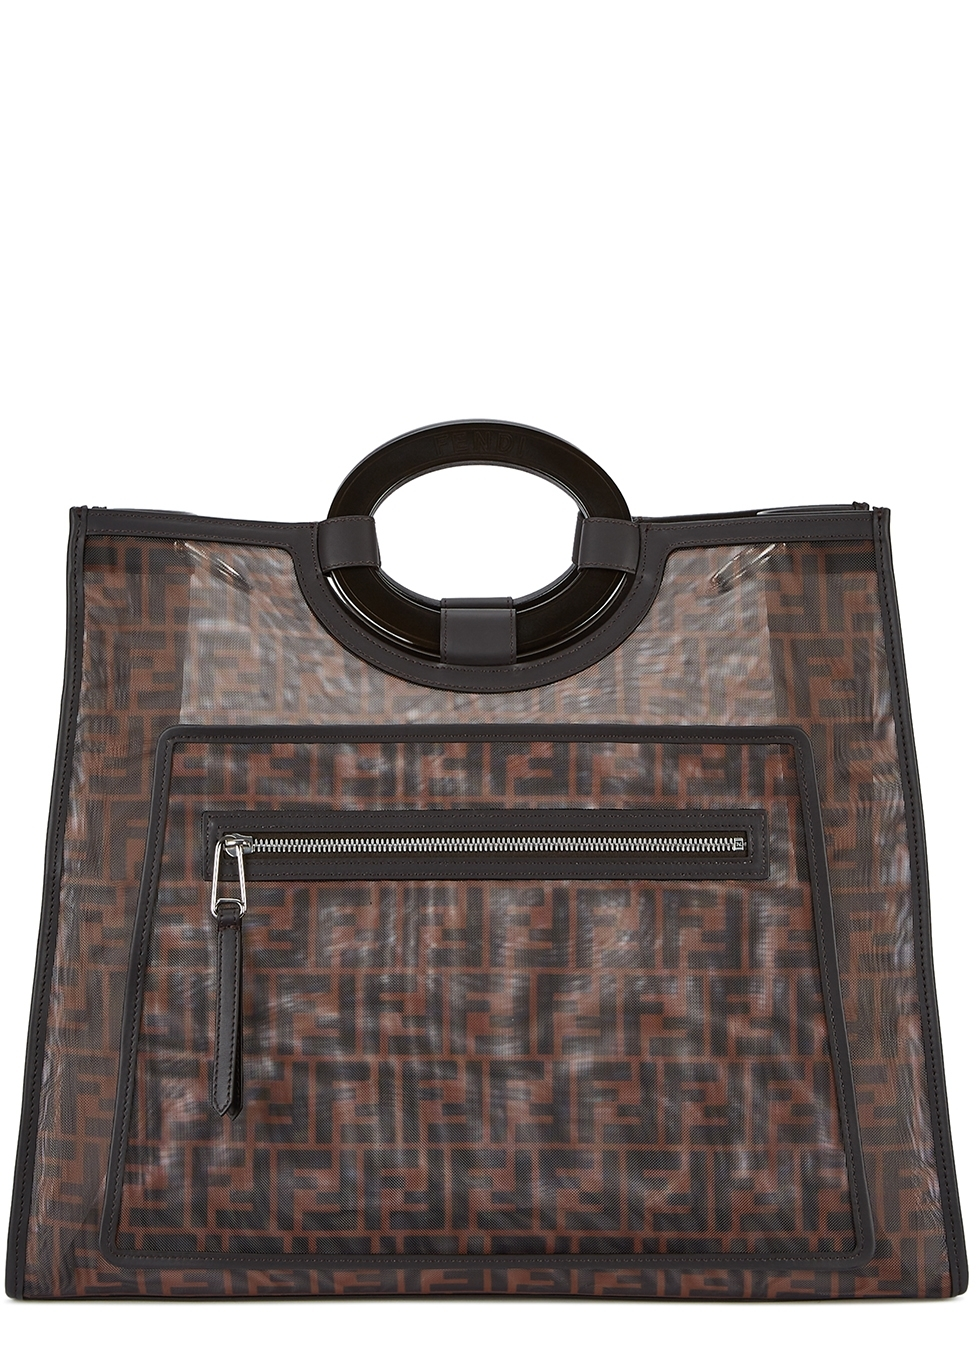 db4f2a63bc6a Fendi Kan I F medium leather shoulder bag - Harvey Nichols